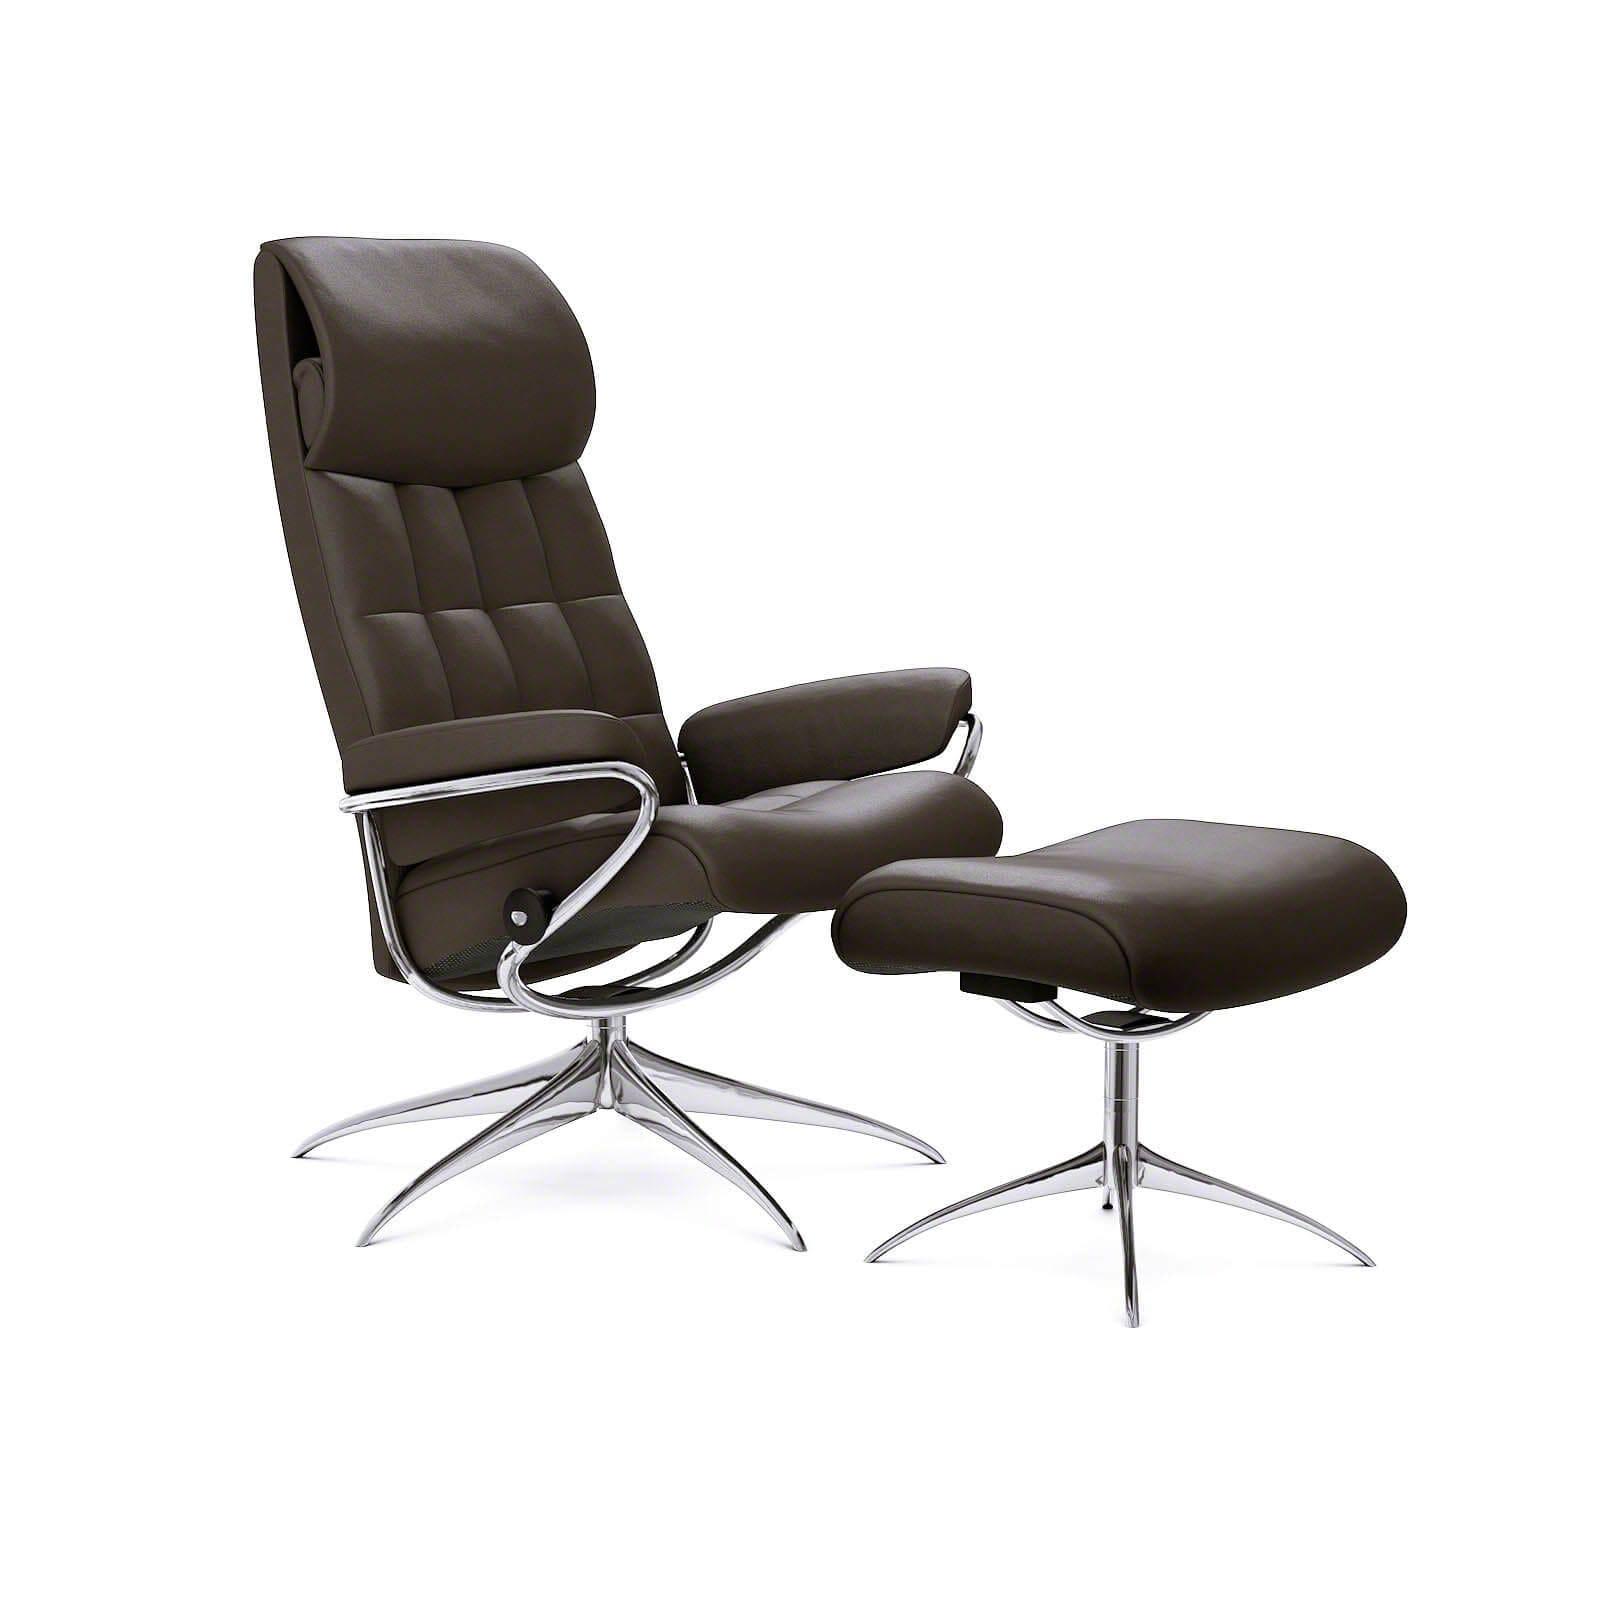 stressless london sessel mit hoher lehne lederfarbe khaki. Black Bedroom Furniture Sets. Home Design Ideas